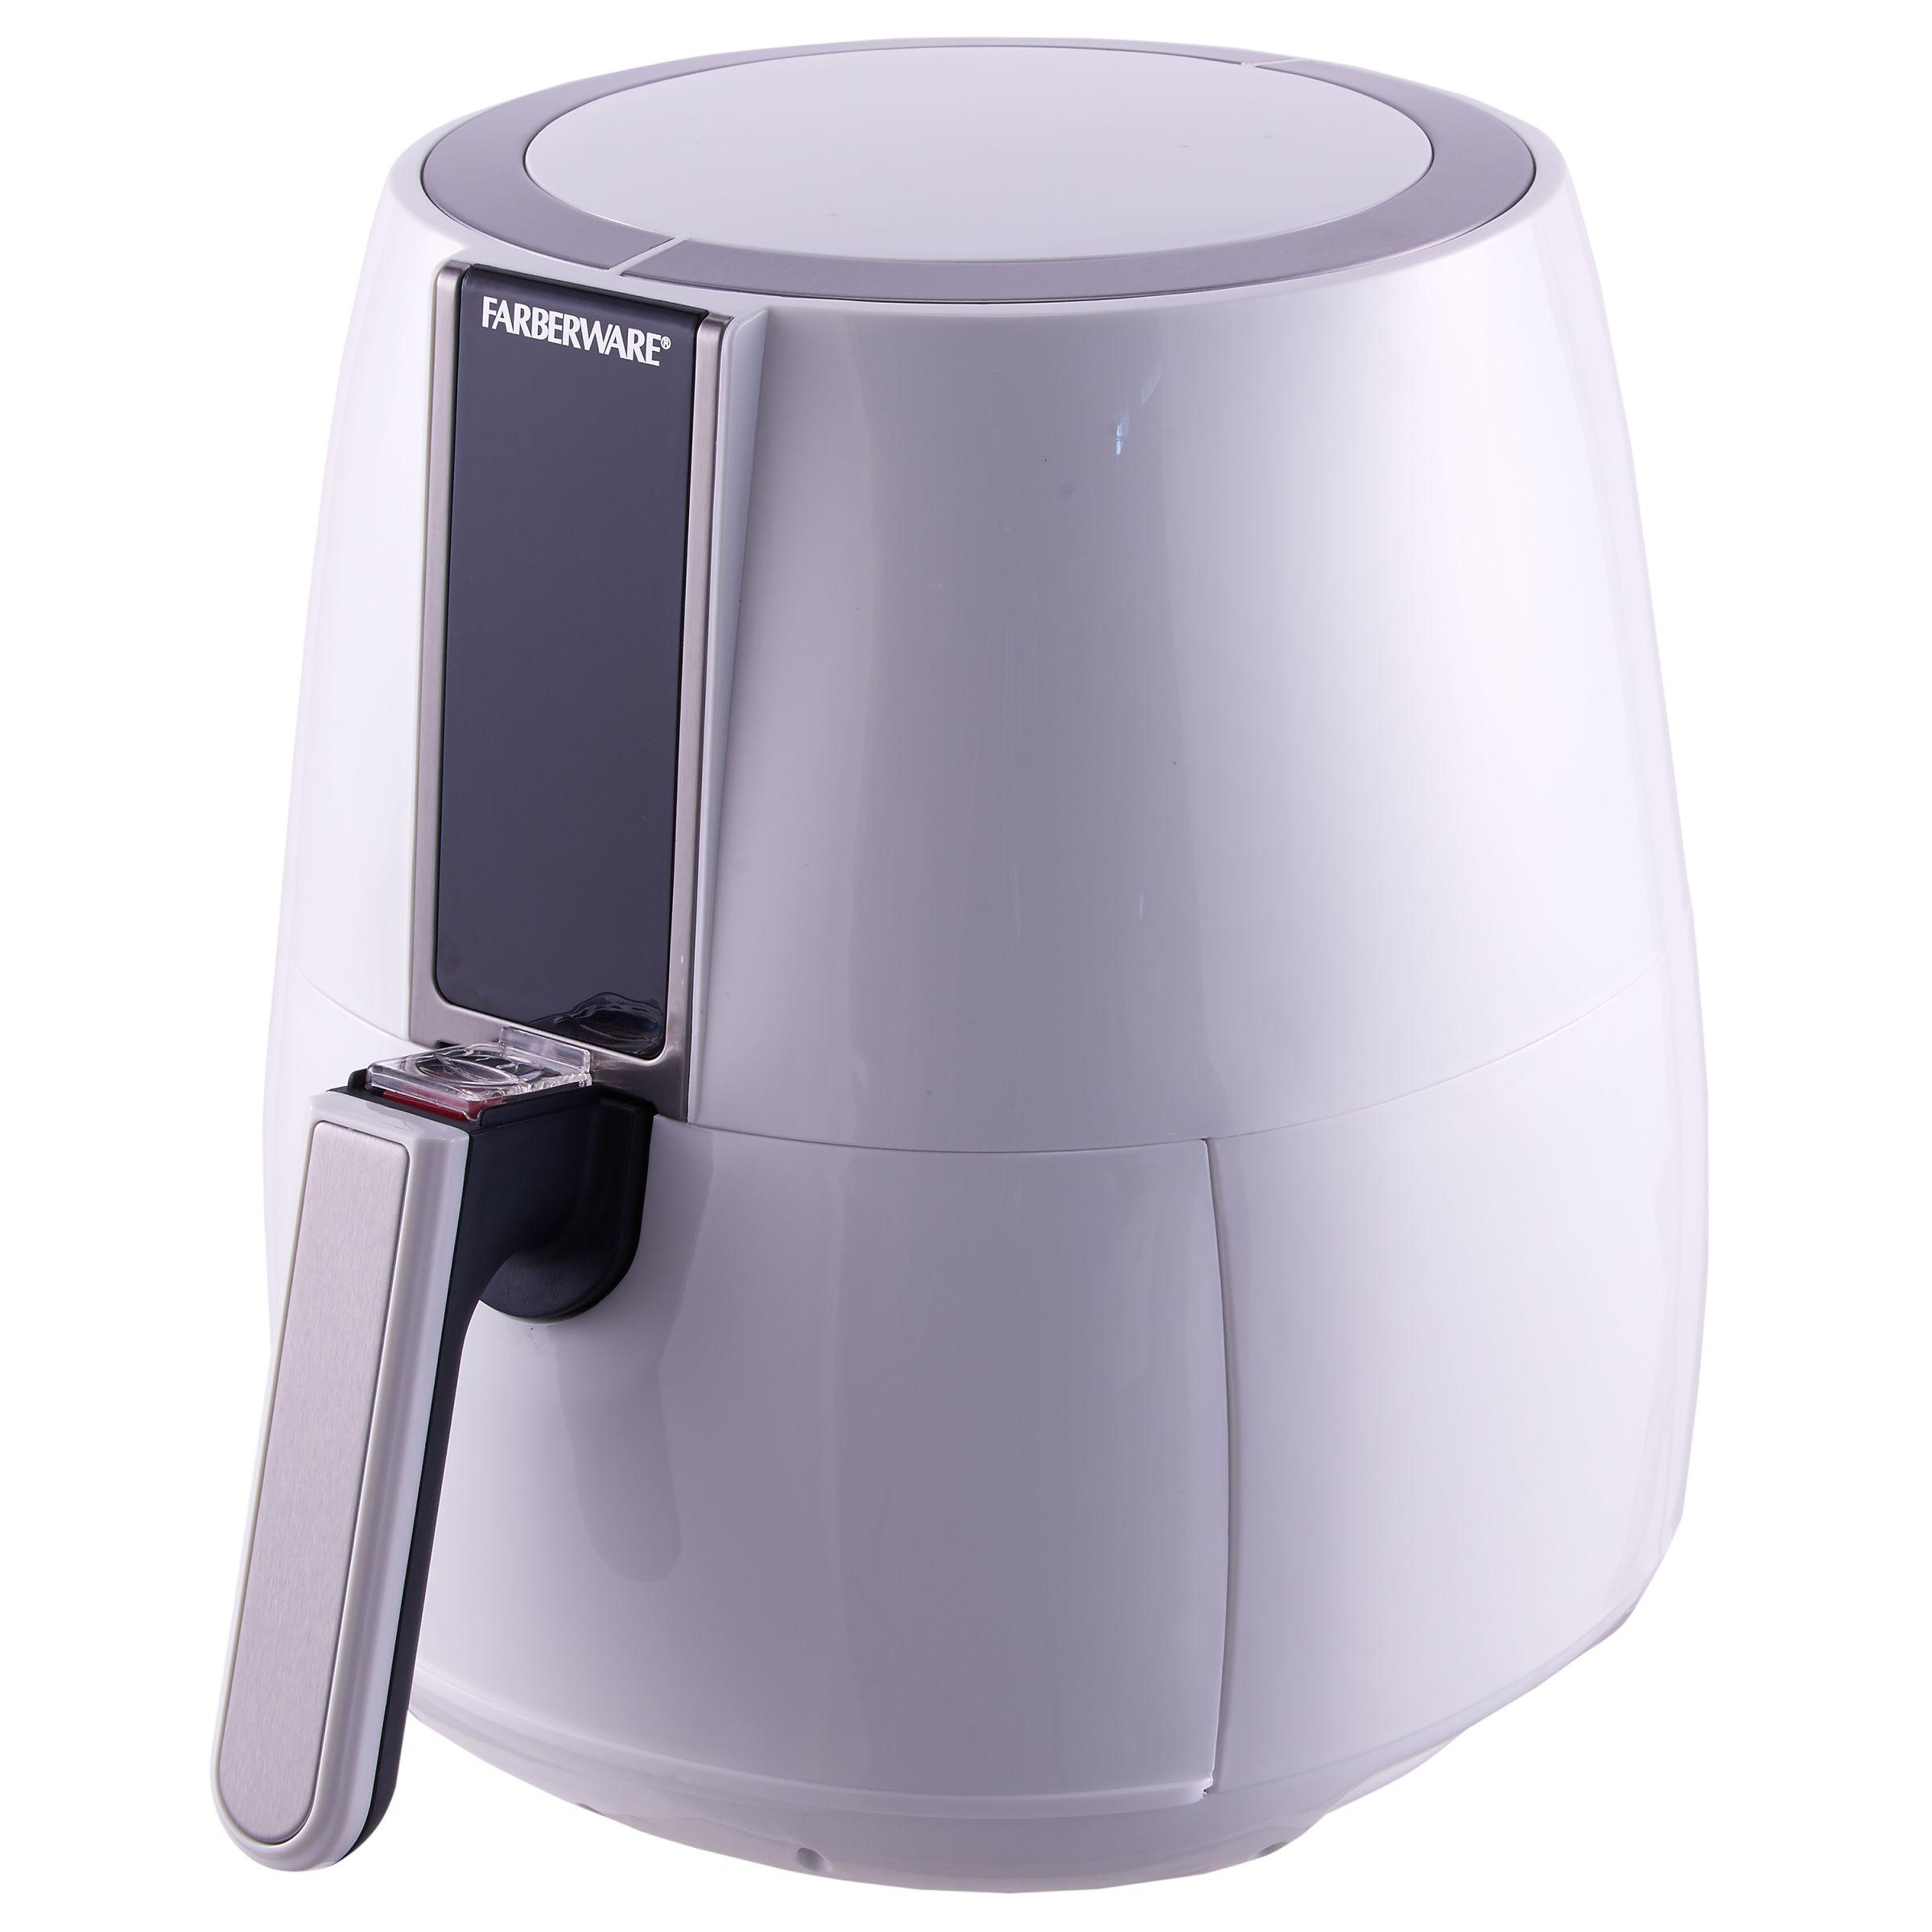 Farberware 3 2 Quart Digital Air Fryer Oil Less White Walmart Com Oil Less Fryer Farberware Coconut Oil For Acne